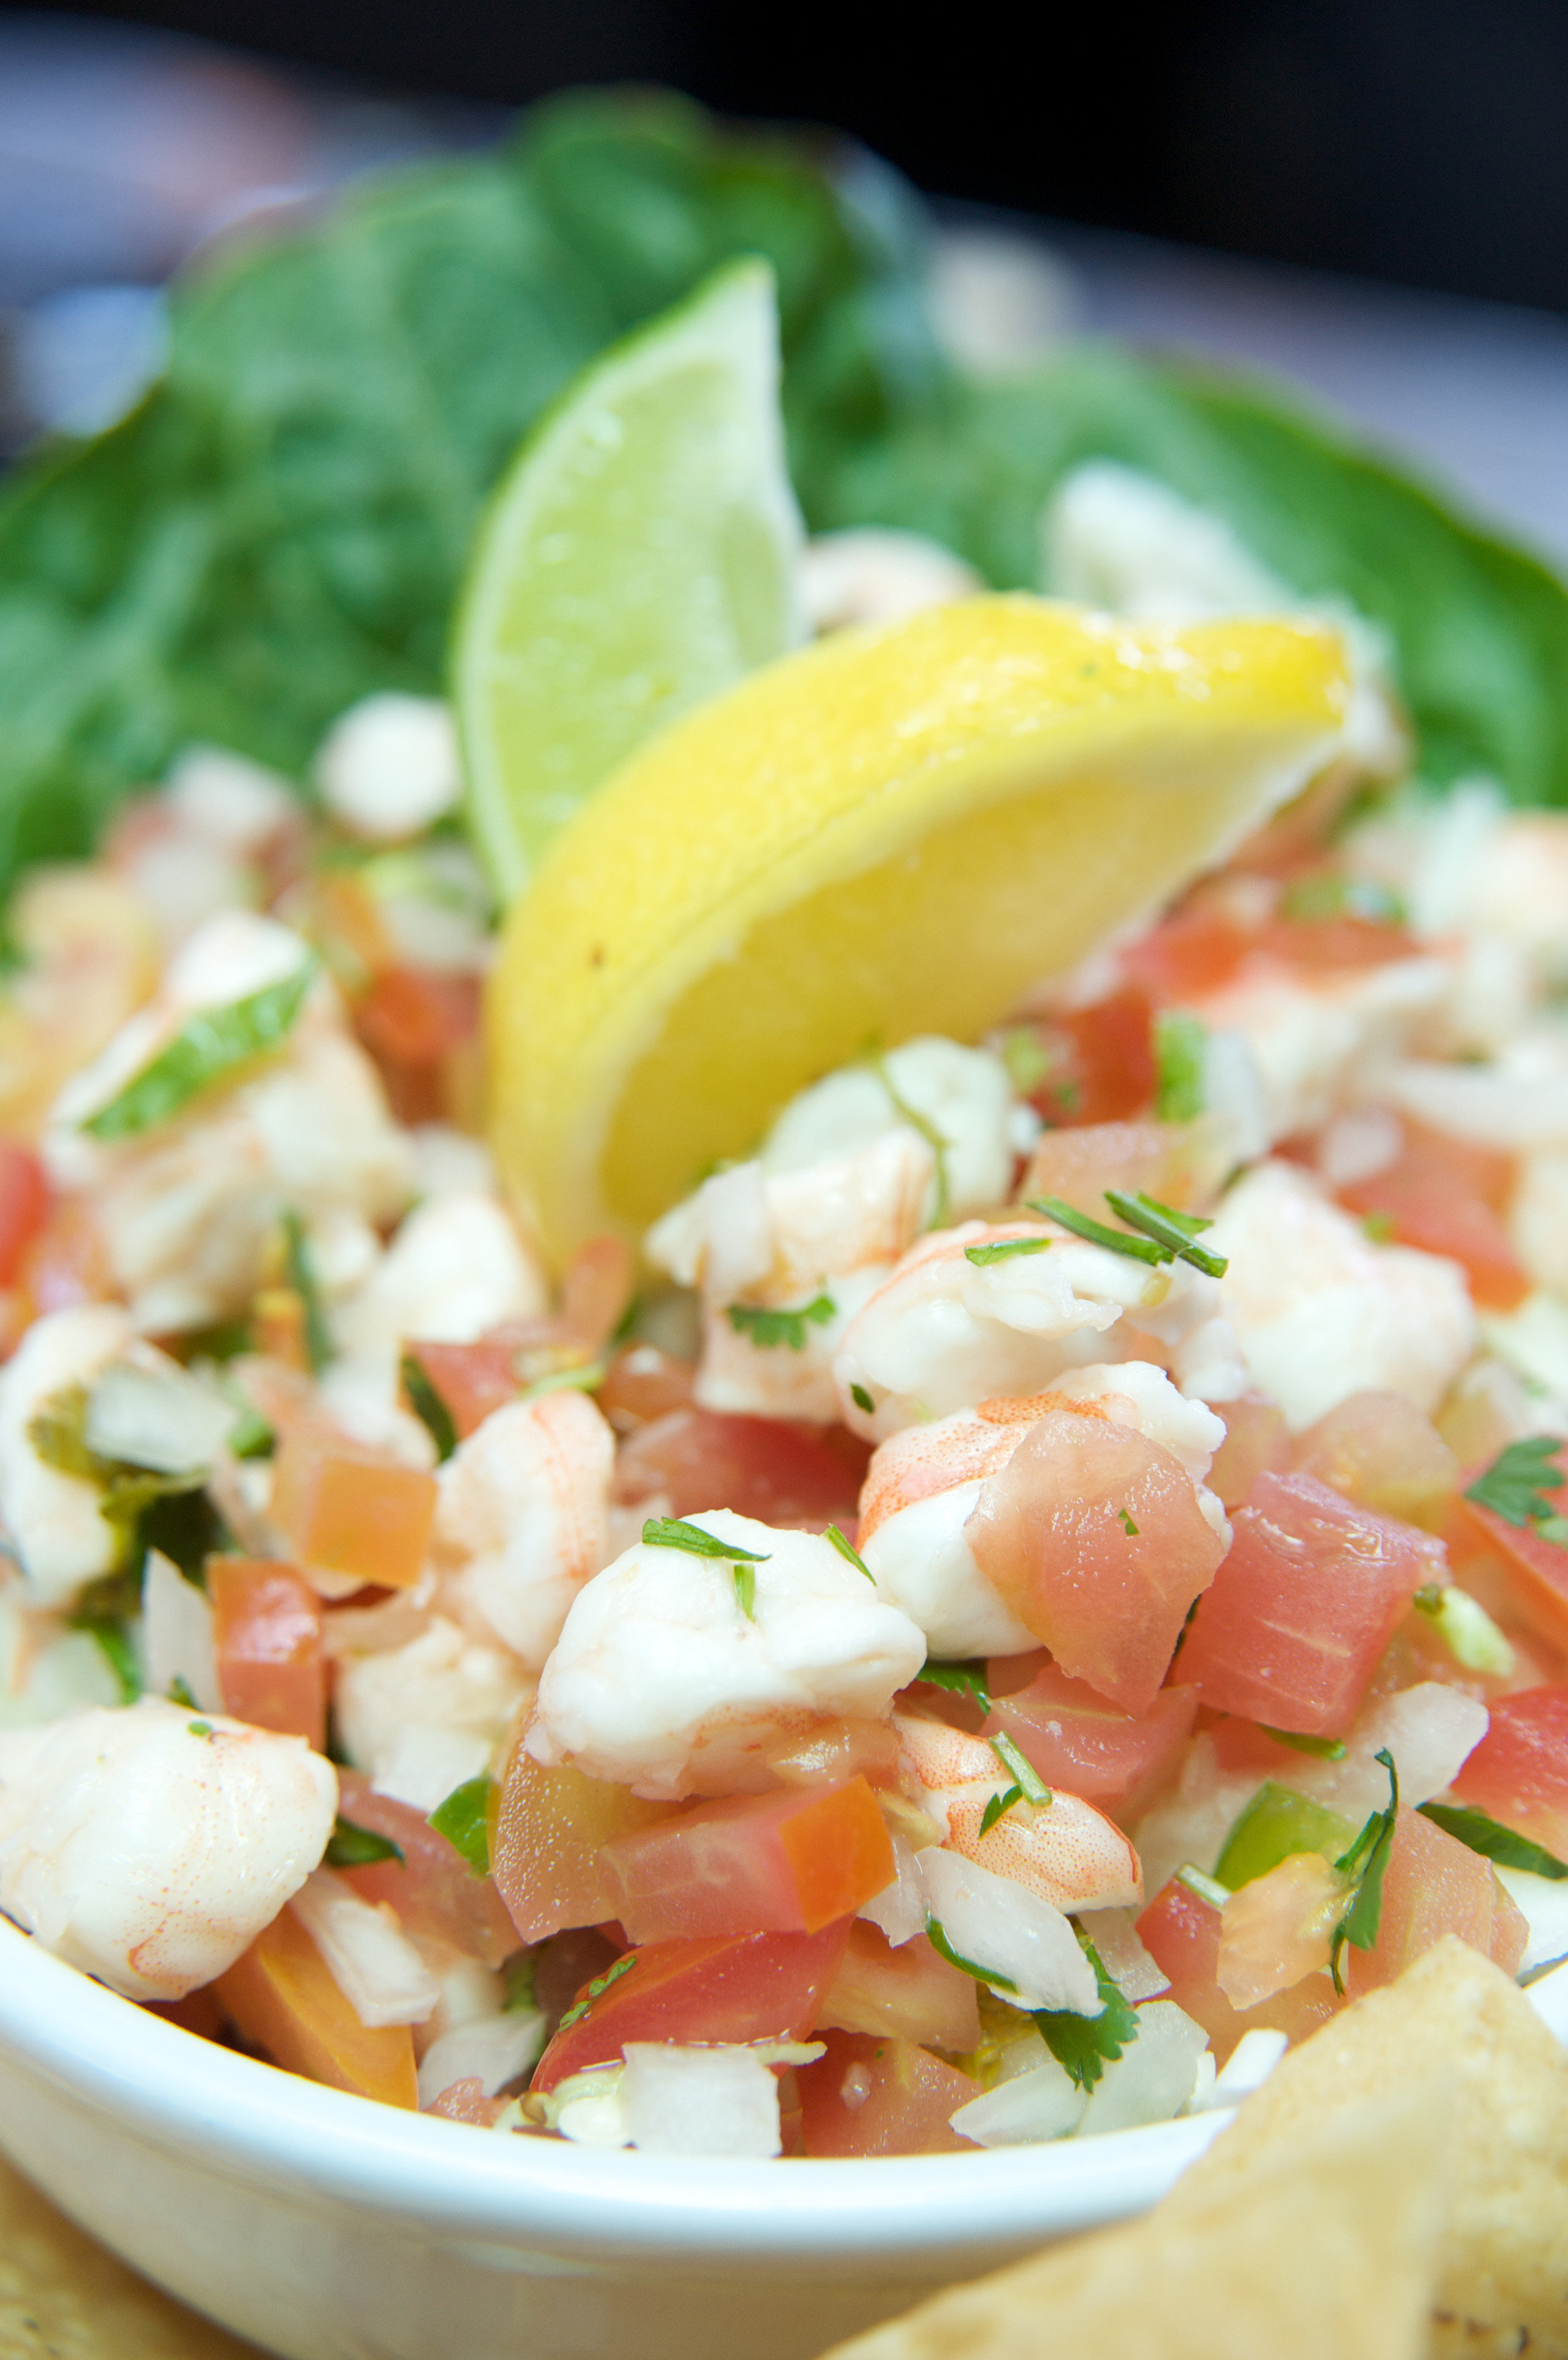 Trip Ideas food dish vegetable salad ceviche bowl cuisine produce Seafood fish shrimp containing close fresh